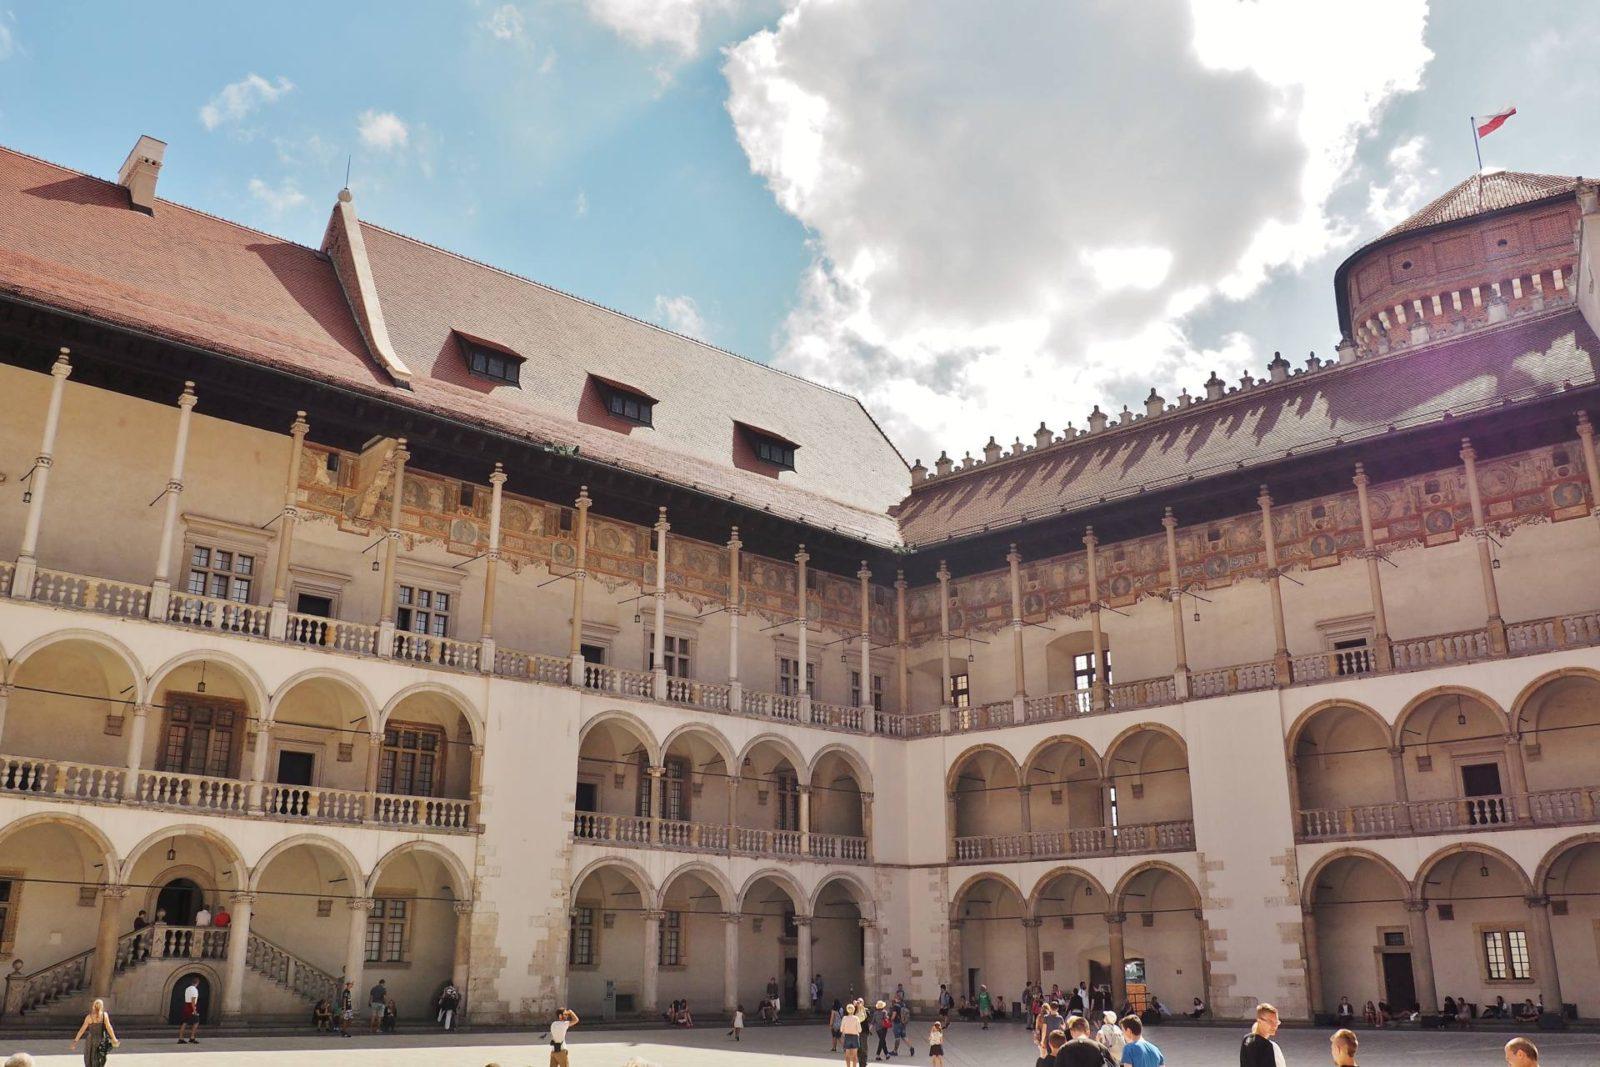 Emma Victoria Stokes Wawel Royal Castle Krakow